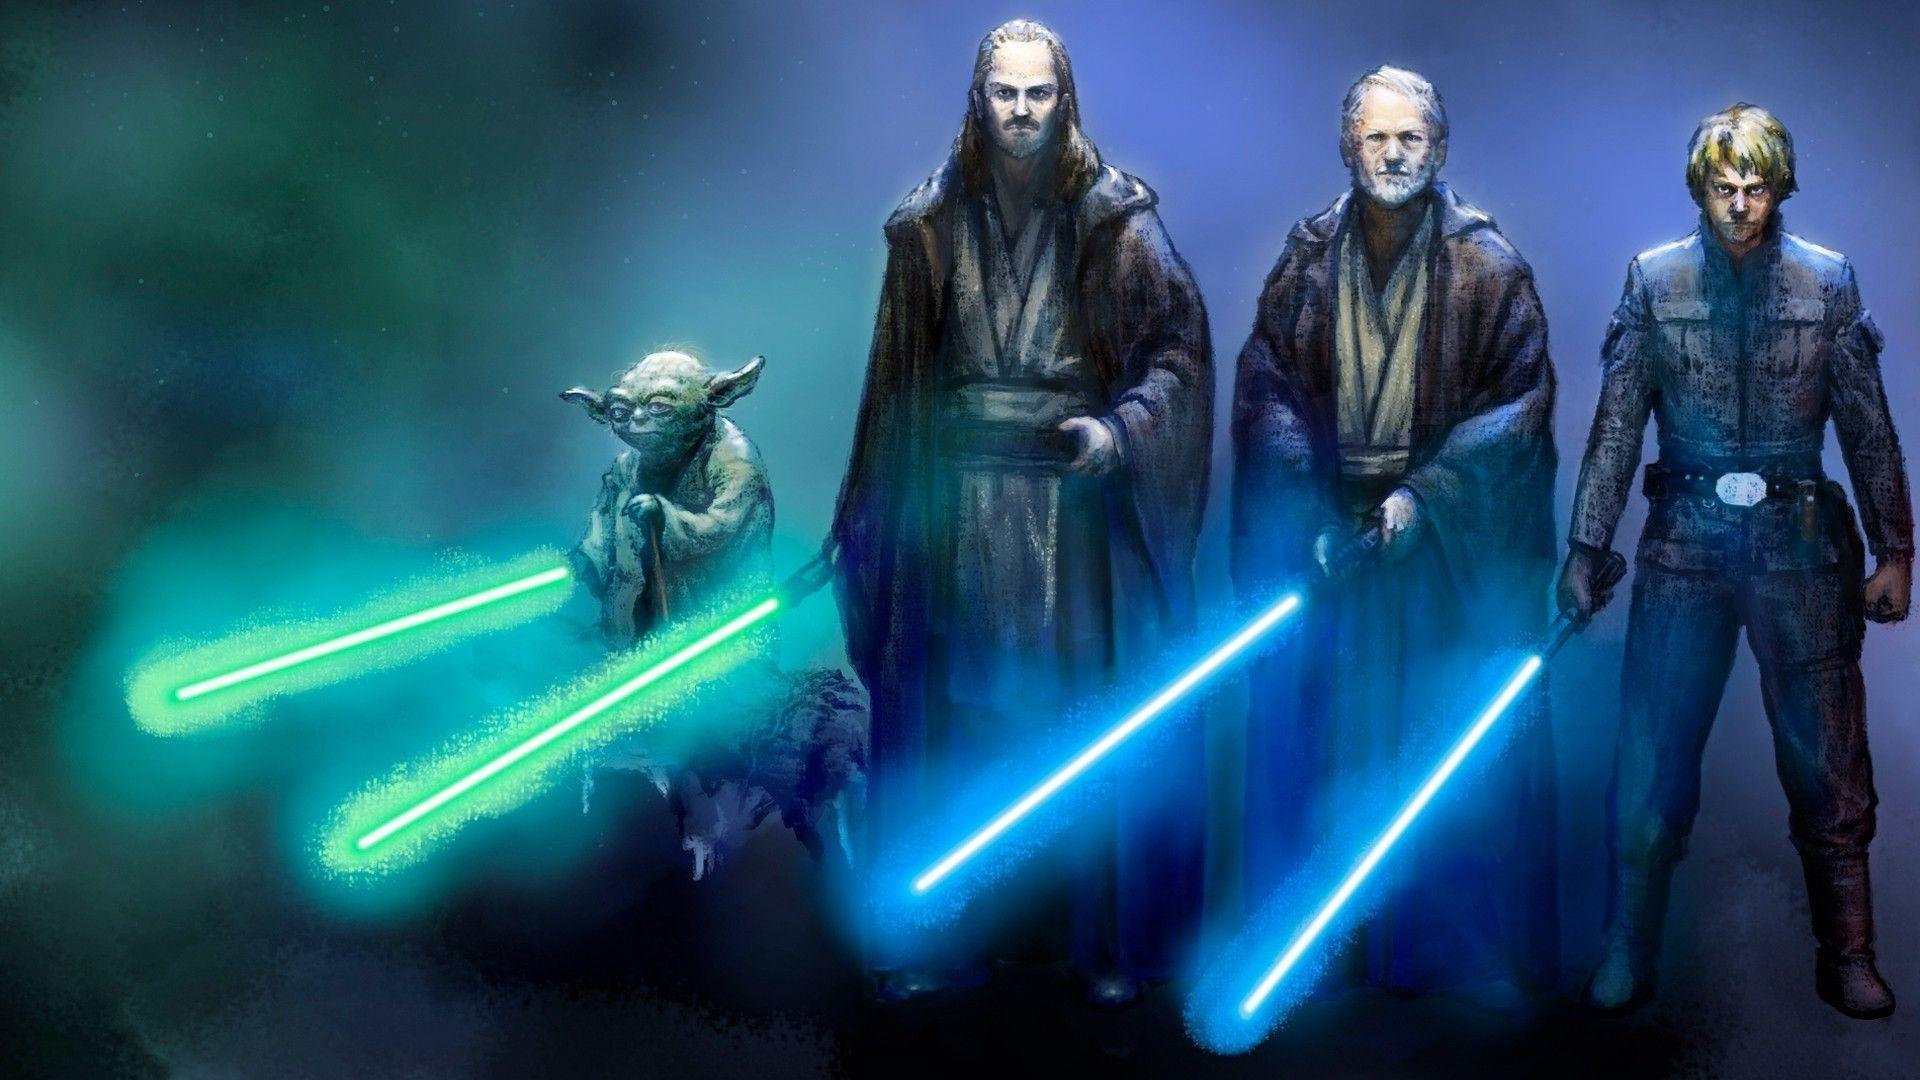 Star Wars Jedi Wallpapers Top Free Star Wars Jedi Backgrounds Wallpaperaccess